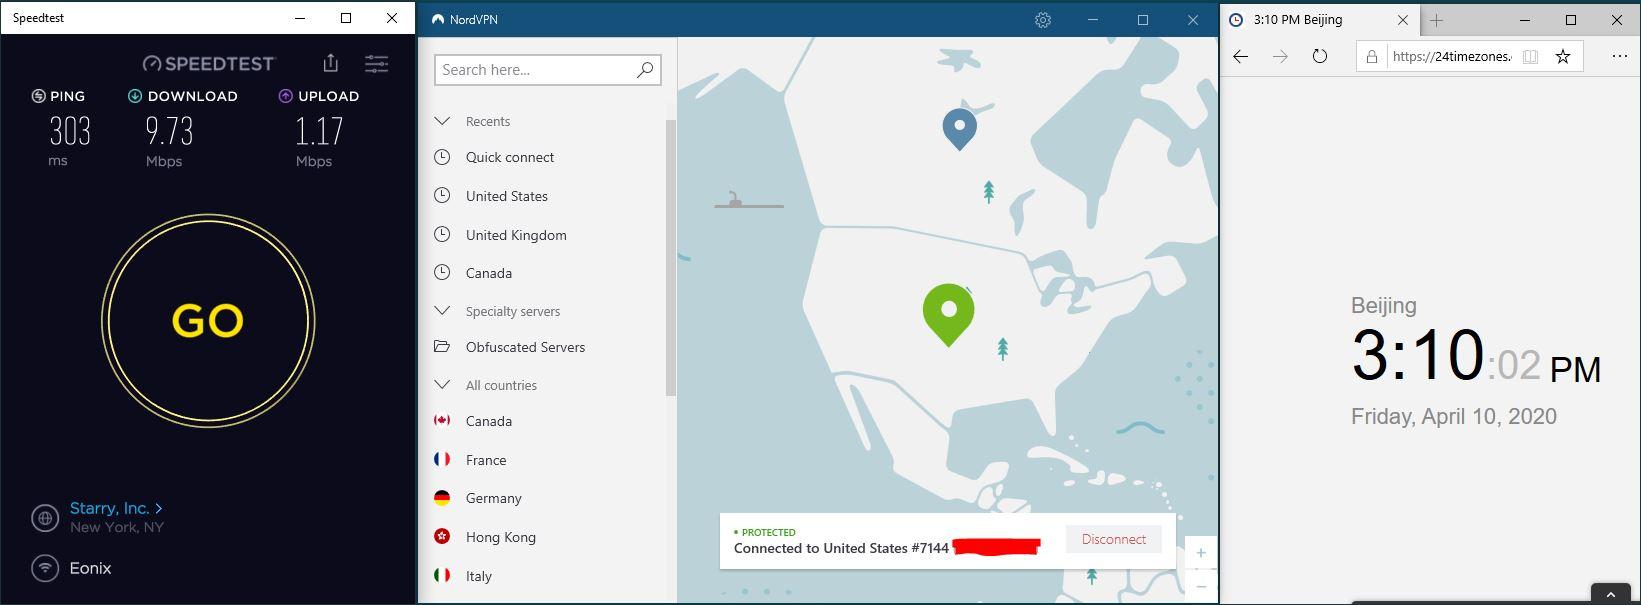 Windows10 NordVPN USA #7144 中国VPN翻墙 科学上网 SpeedTest测速-20200410